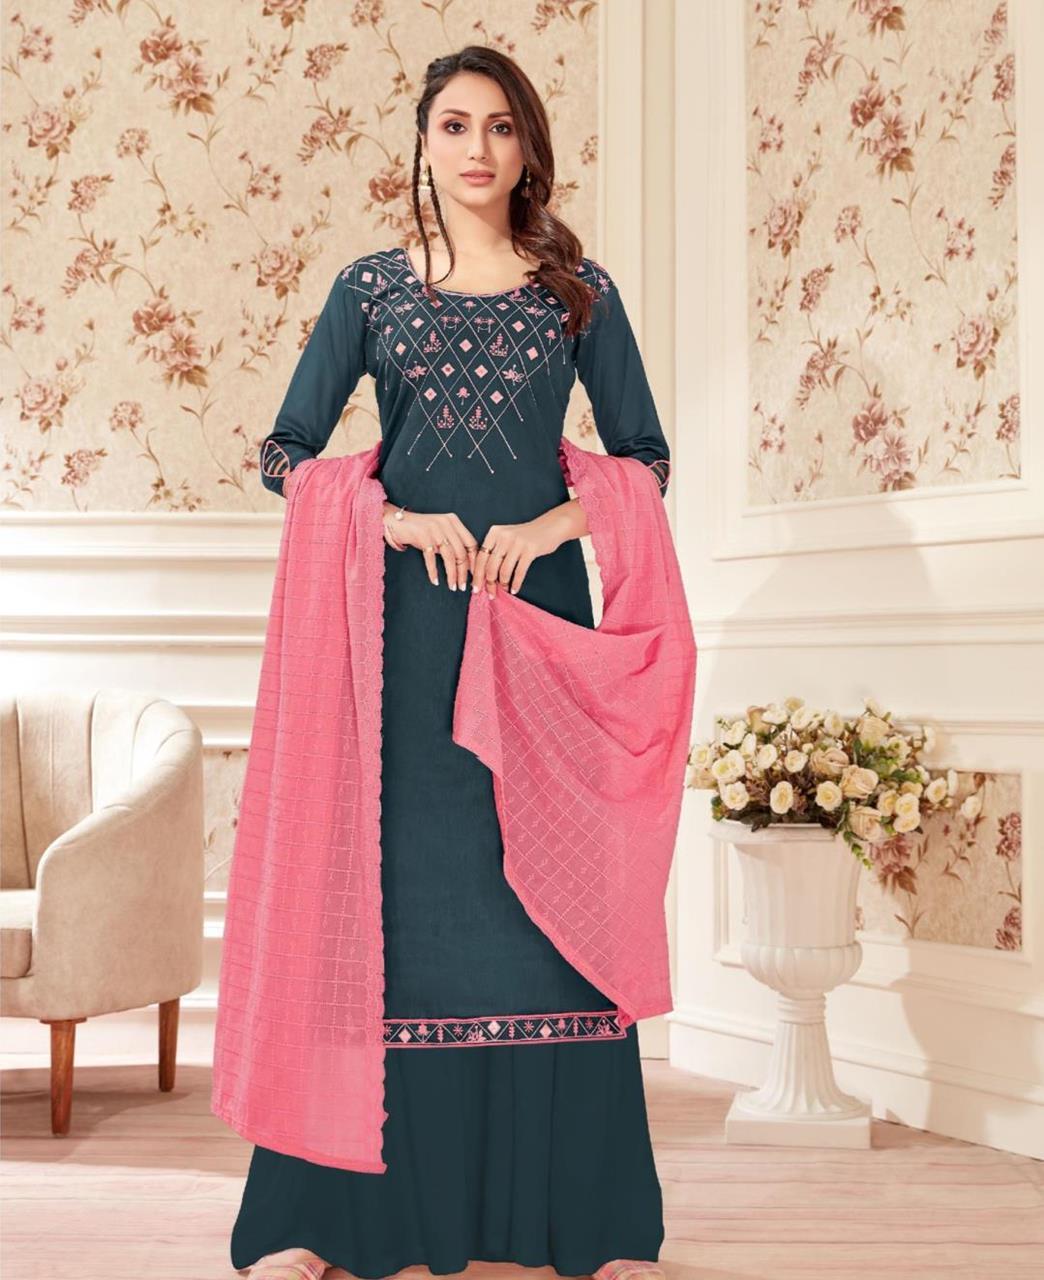 Embroidered Cotton Straight cut Salwar Kameez in Black